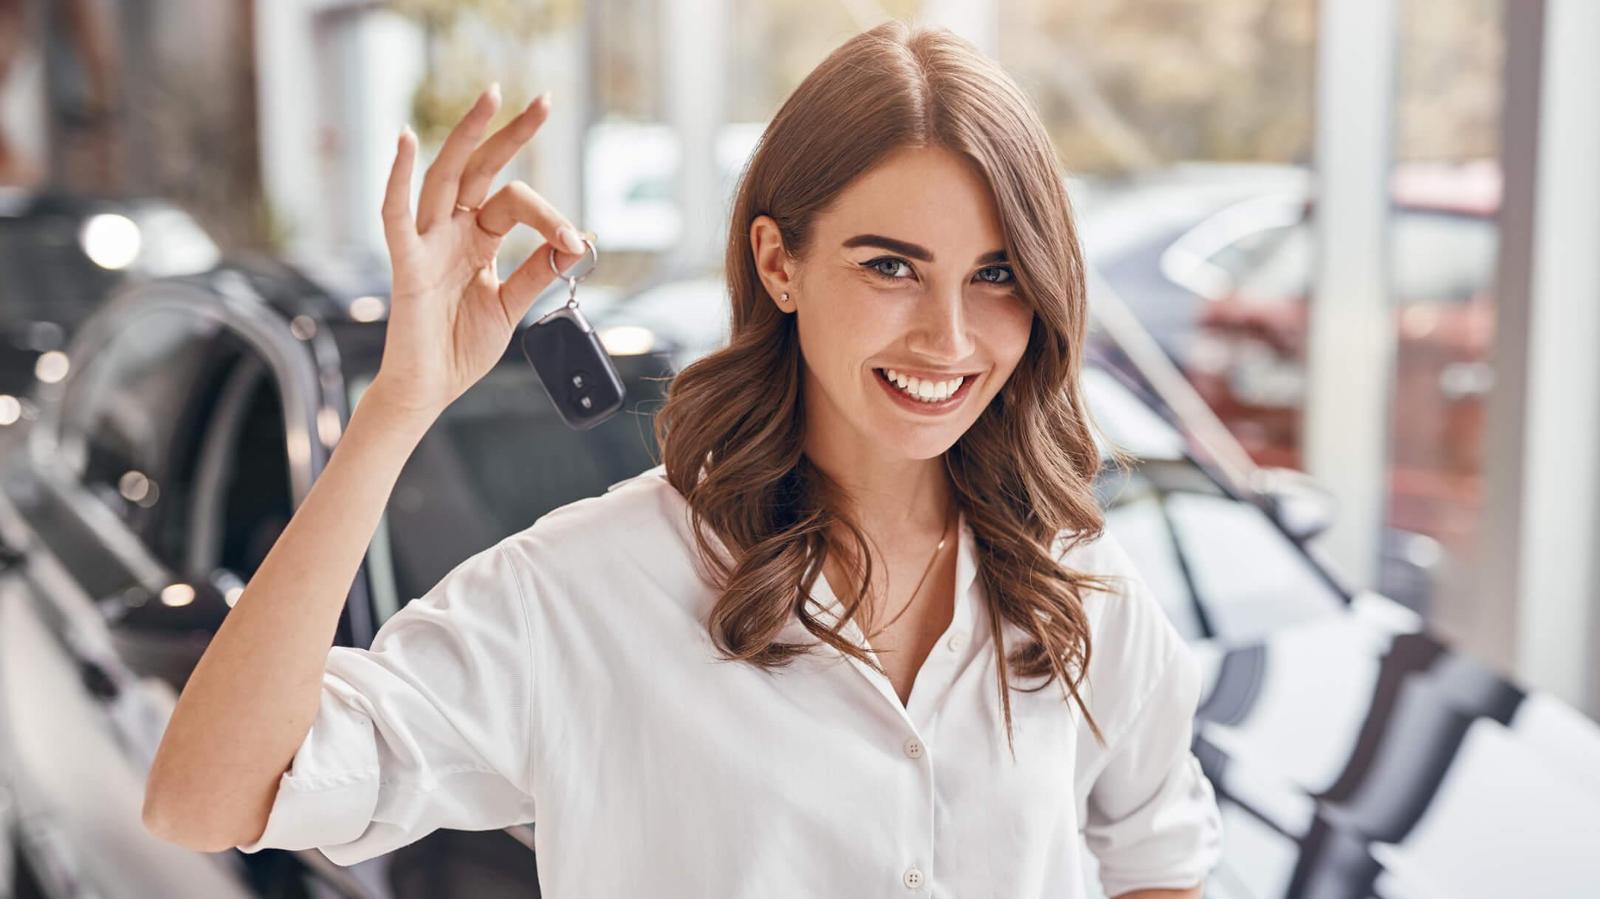 Happy Customer holding key